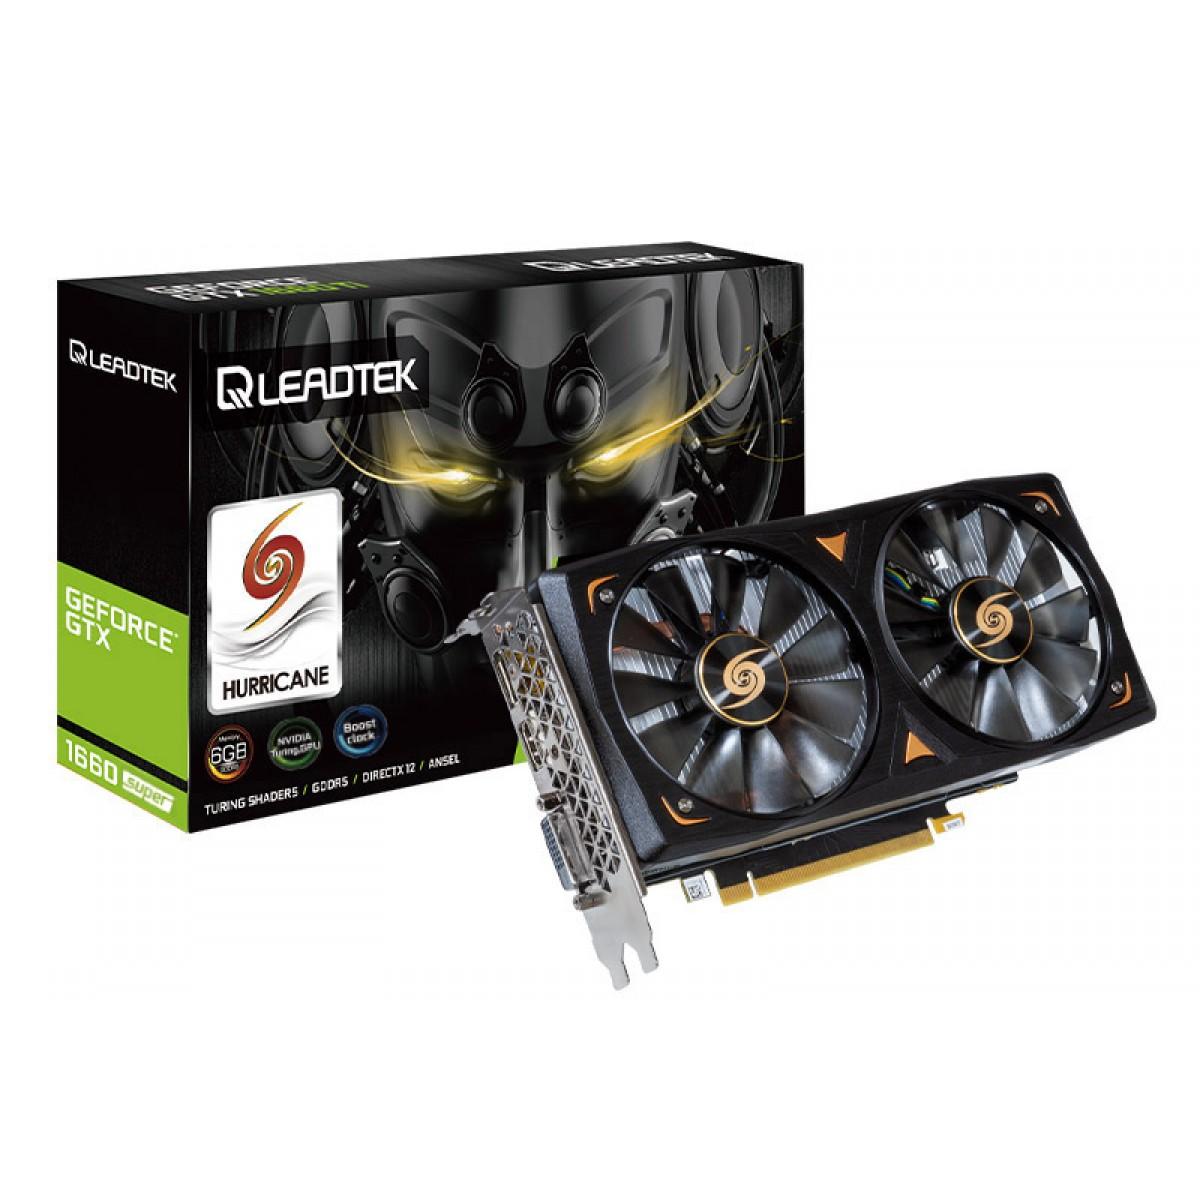 Placa de Vídeo Leadtek WinFast Geforce GTX 1660 Super Hurricane, 6GB, GDDR6, 192bit